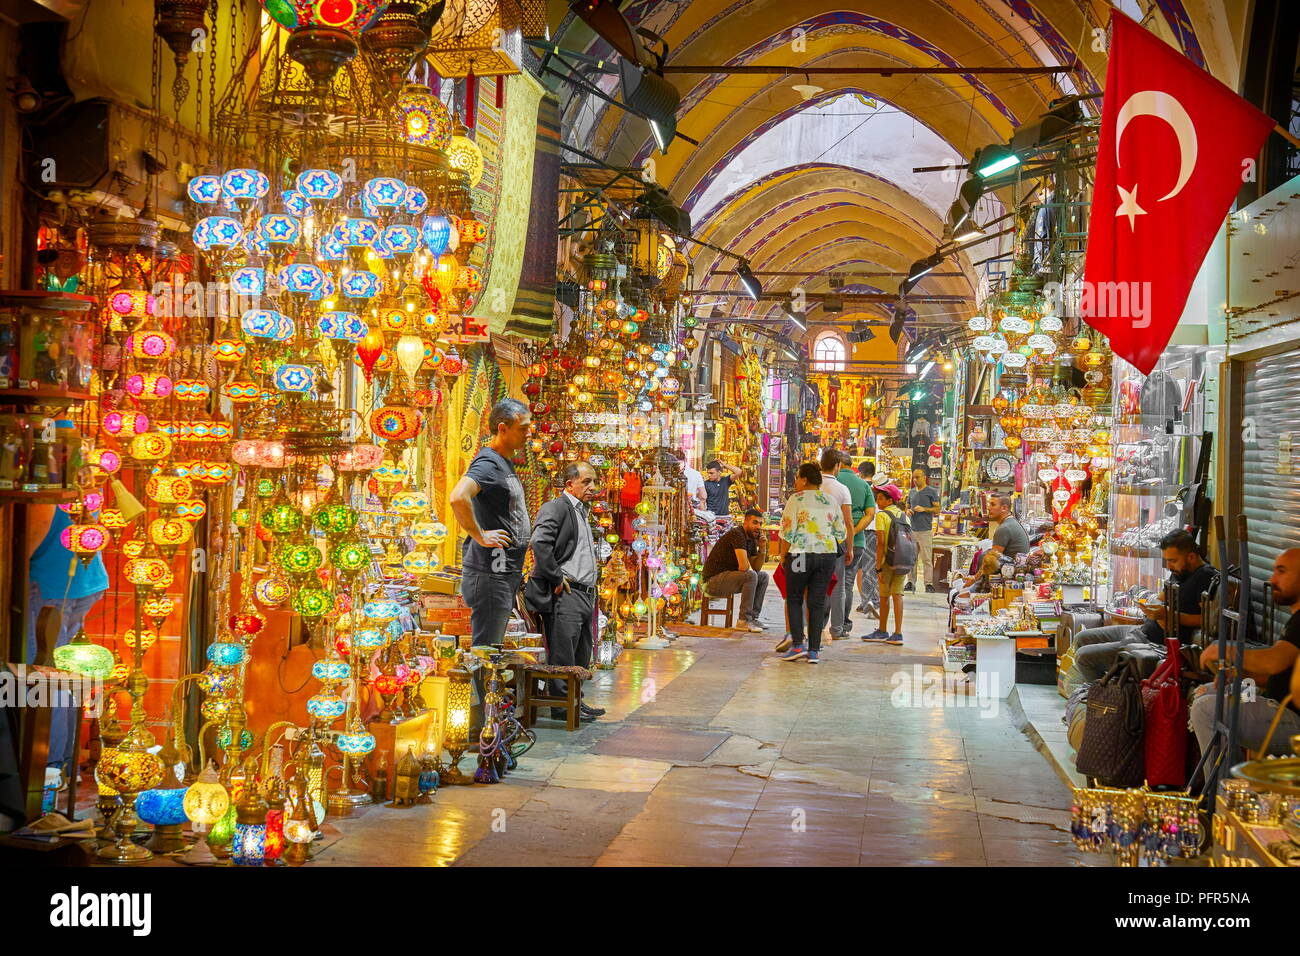 Il Grand Bazaar, Istanbul, Turchia Immagini Stock